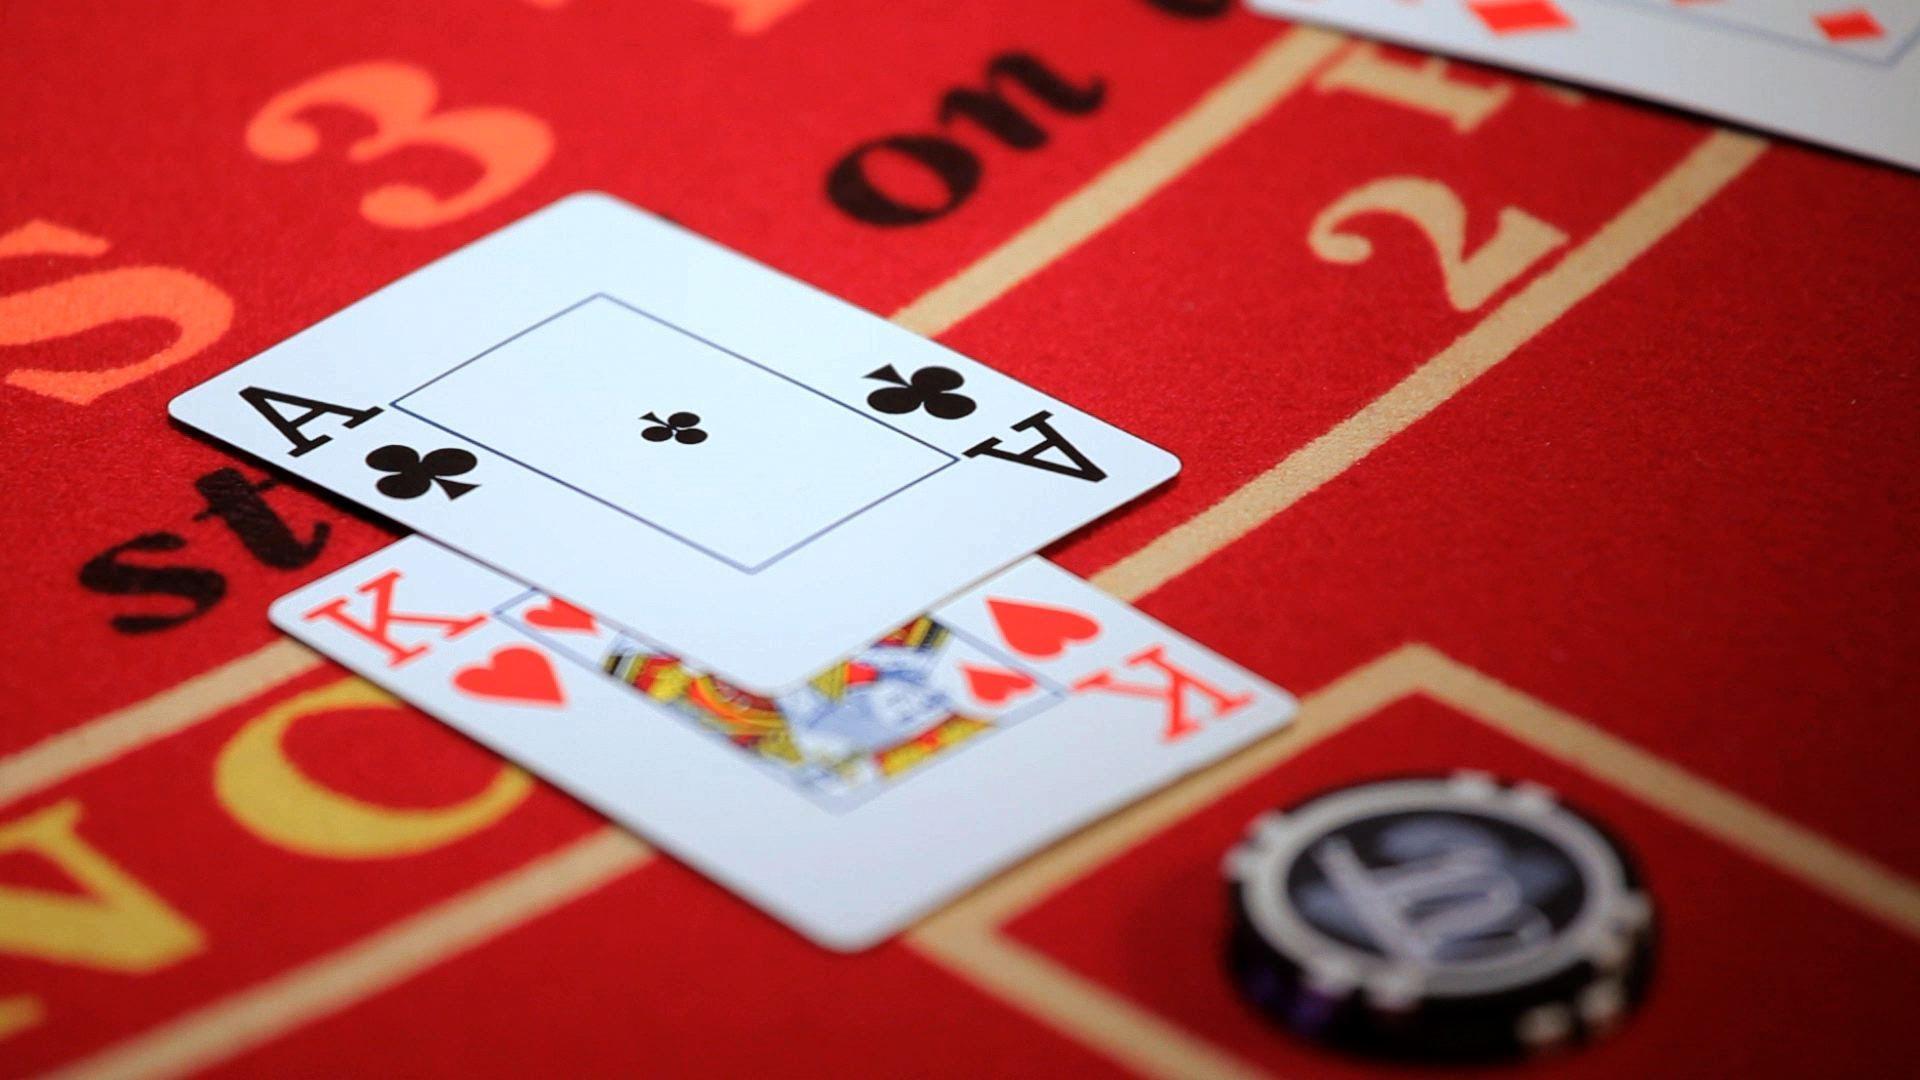 Le mode fun pour le blackjack